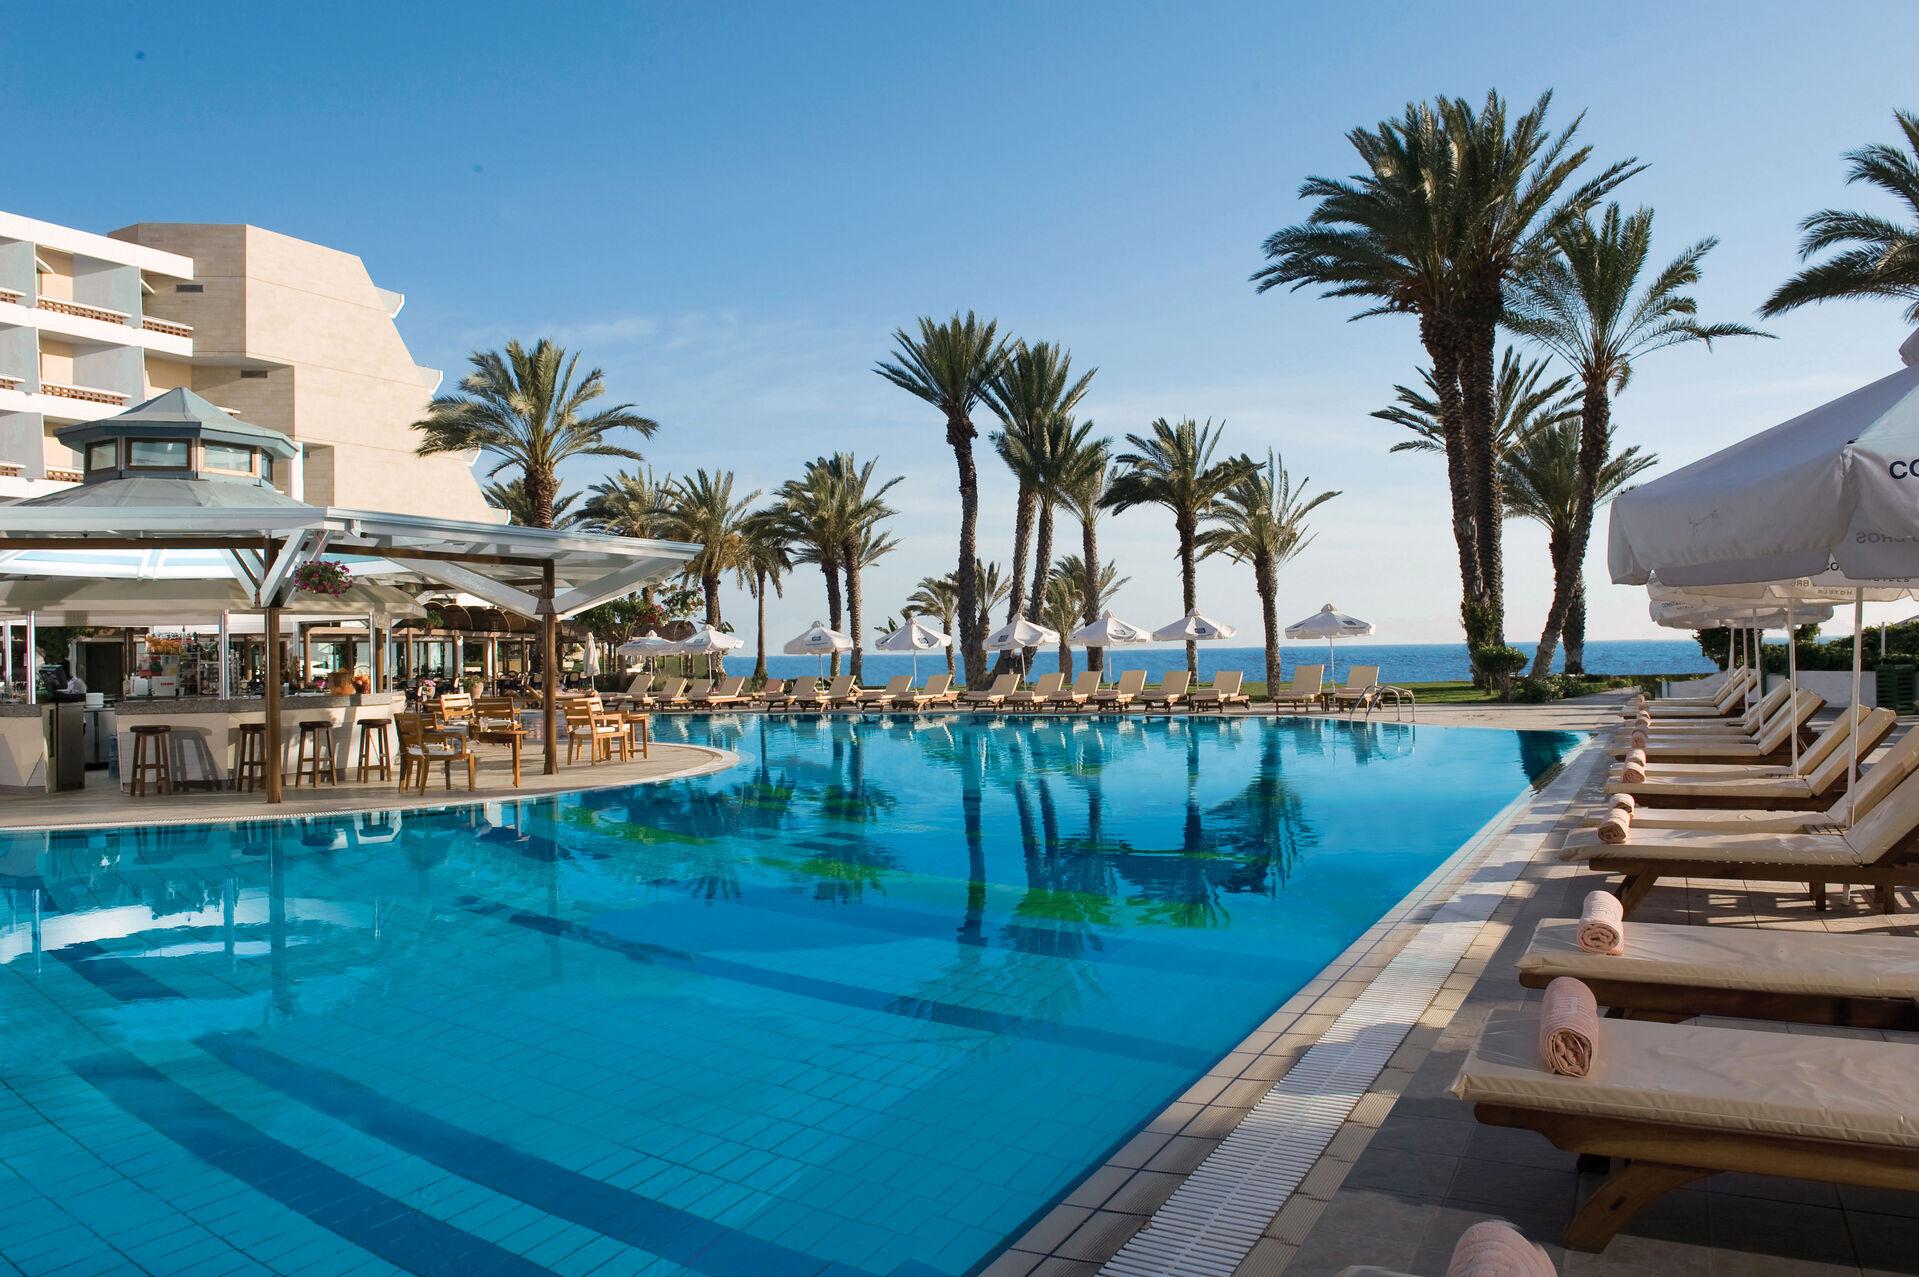 https://cms.satur.sk/data/imgs/tour_image/orig/01-pioneer-beach-hotel-swimming-pool-1972631.jpg